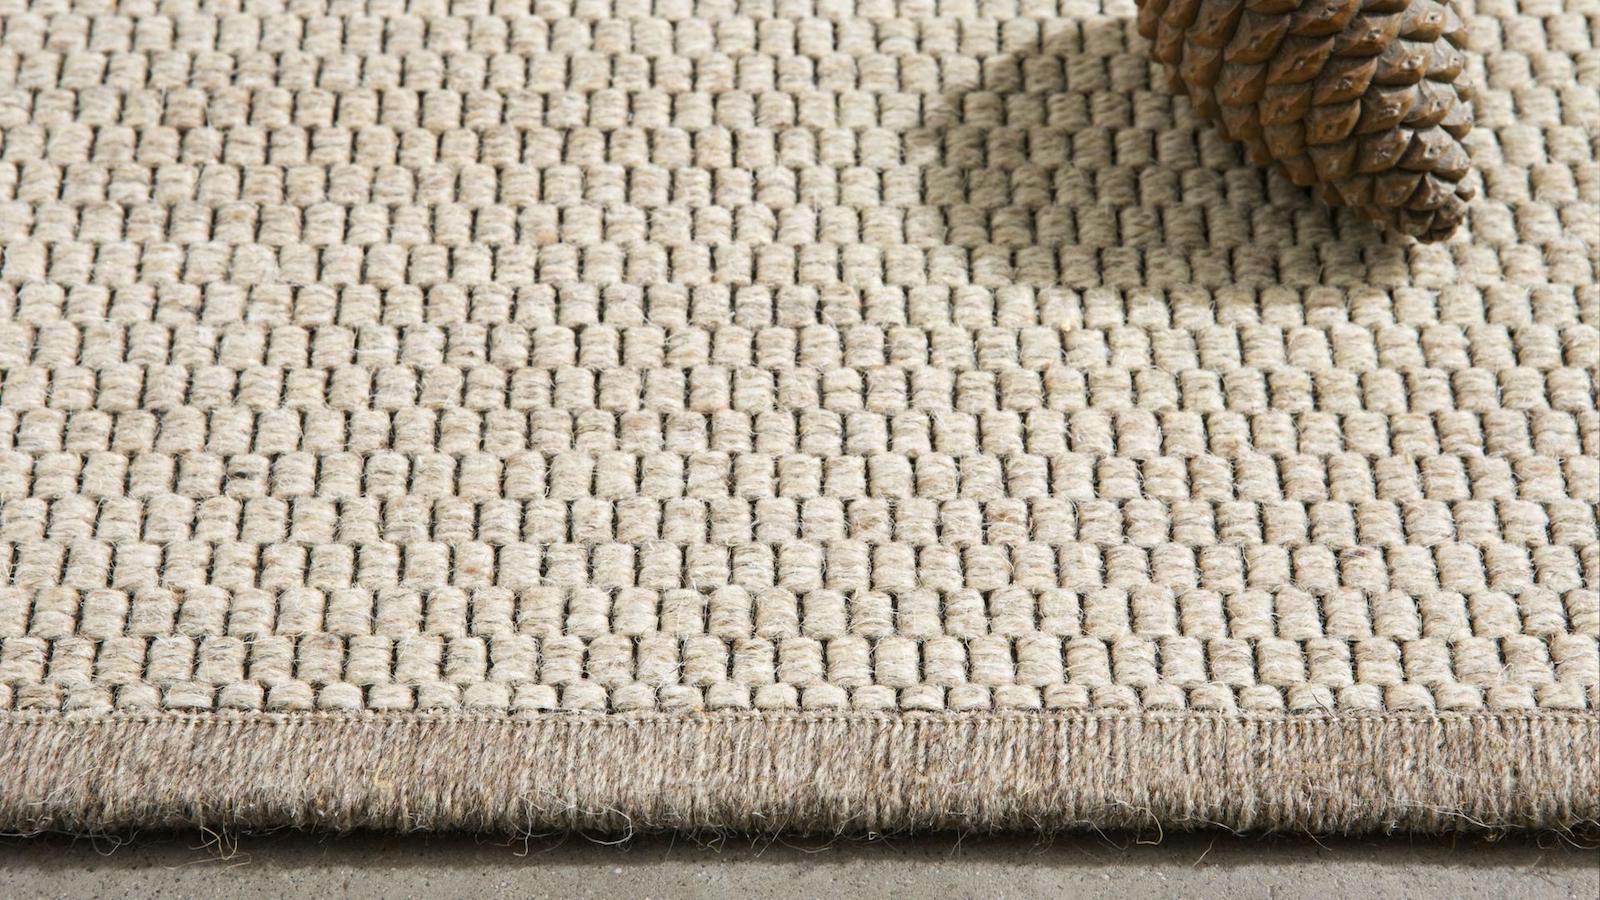 Tienda online alfombras ao eskila 12 montesina - Alfombras kp online ...